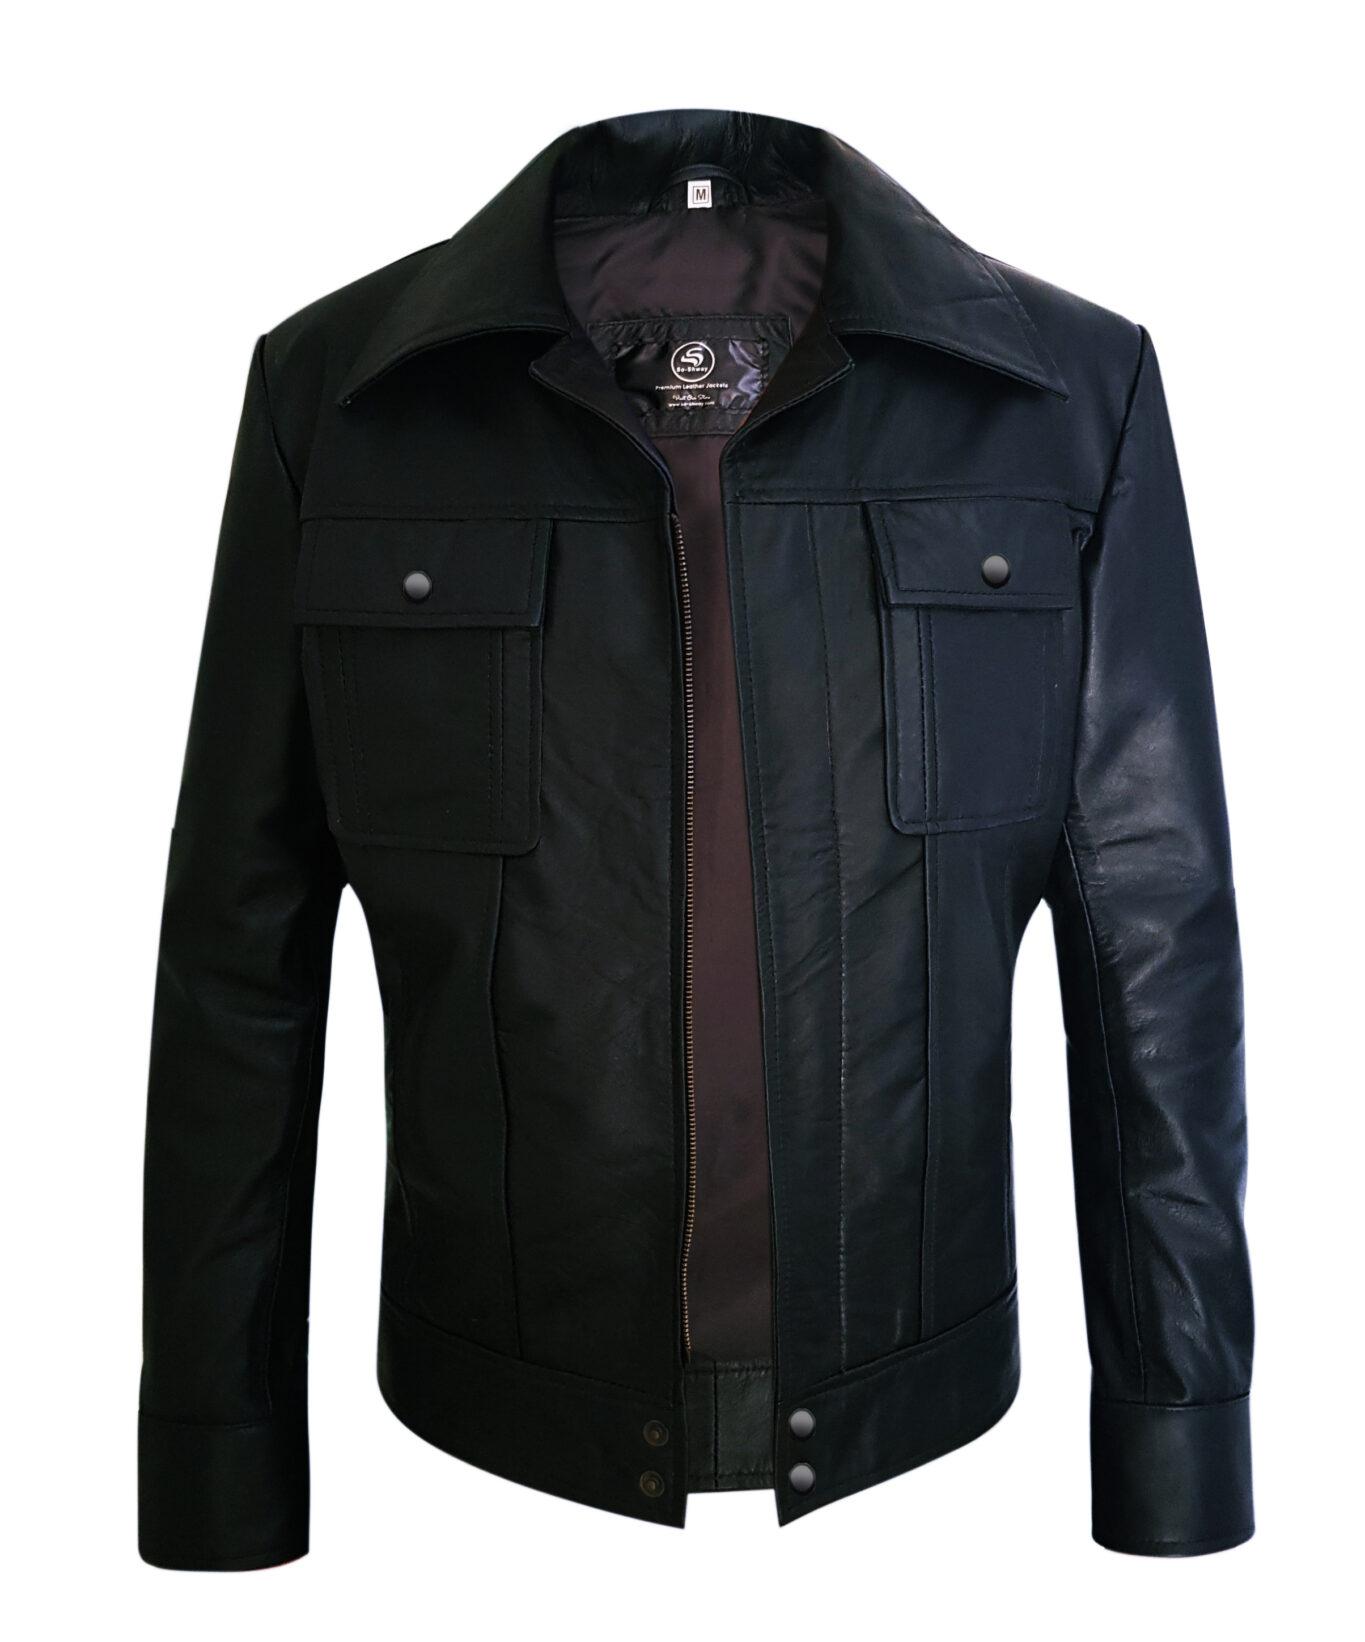 Two Pockets Mens Black Genuine Leather Jacket